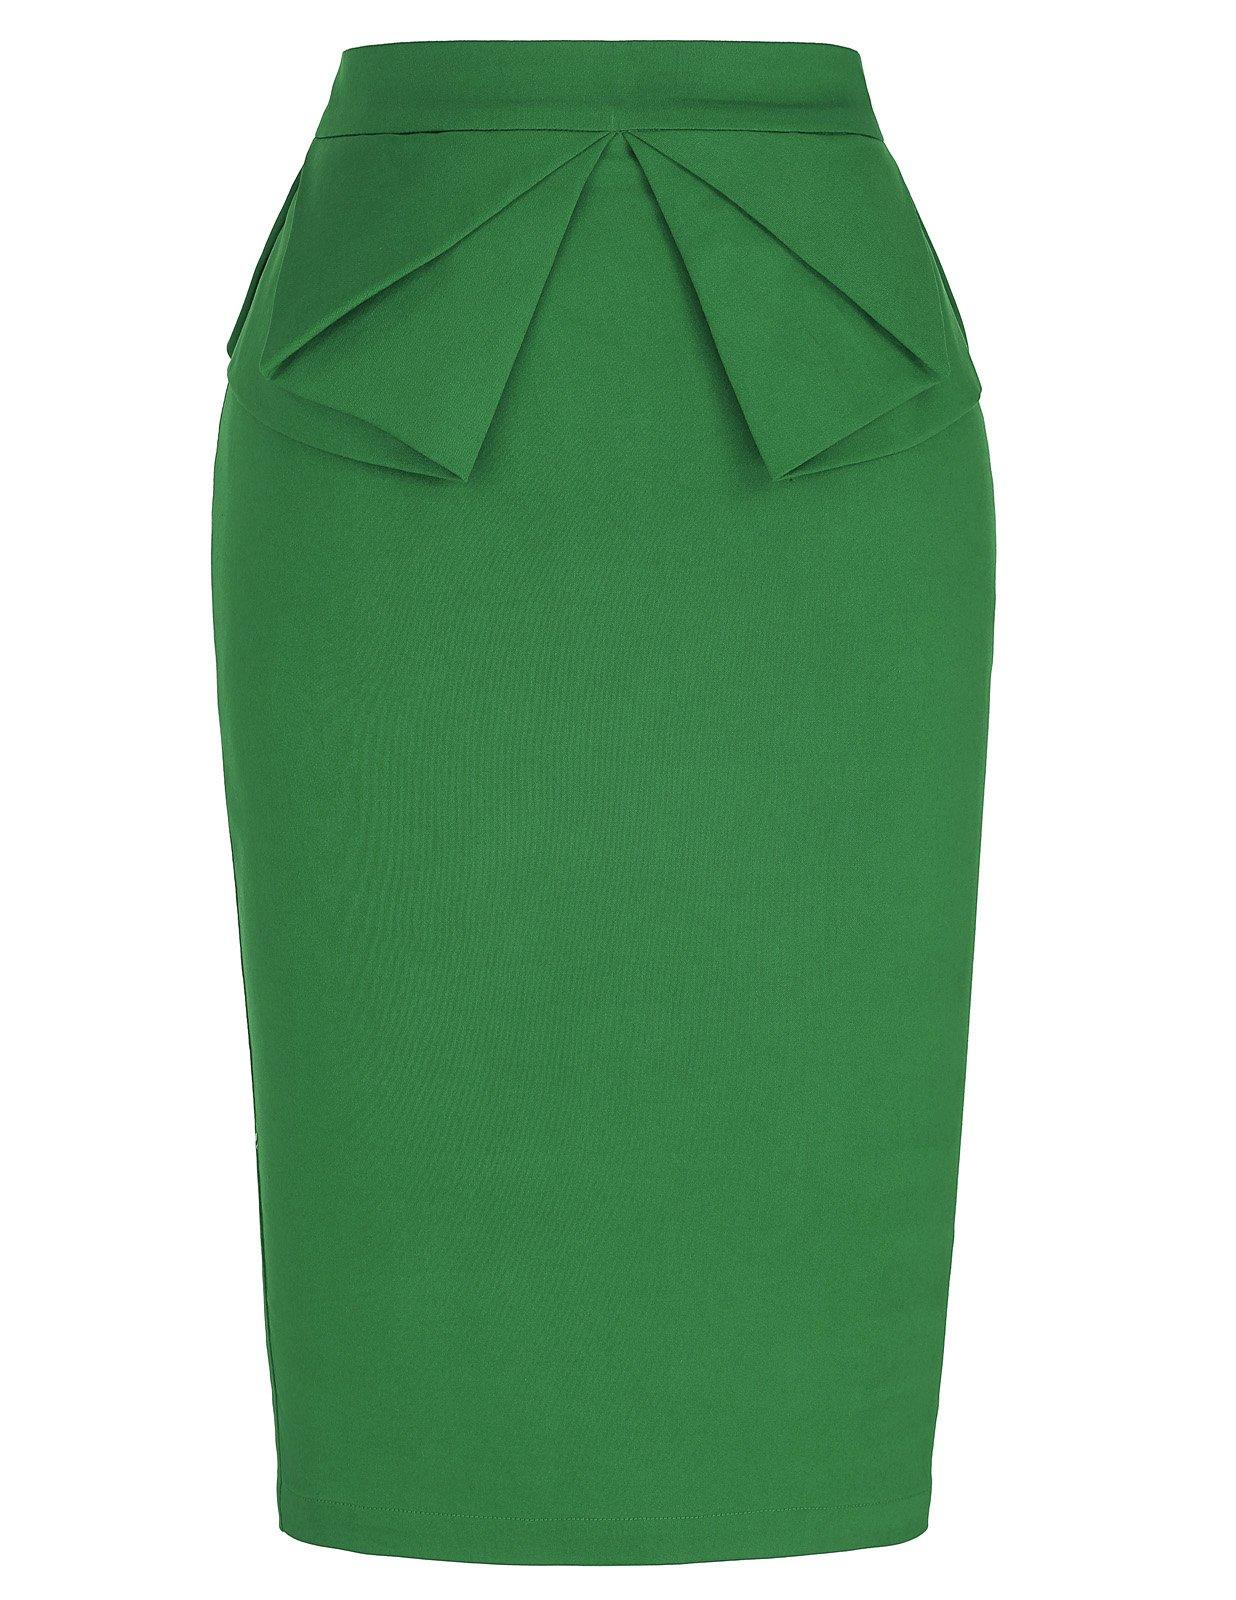 PrettyWorld Vintage Dress Grace Karin Slim Vintage Pencil Skirts For Women, Cl454-green, X-Large by PrettyWorld Vintage Dress